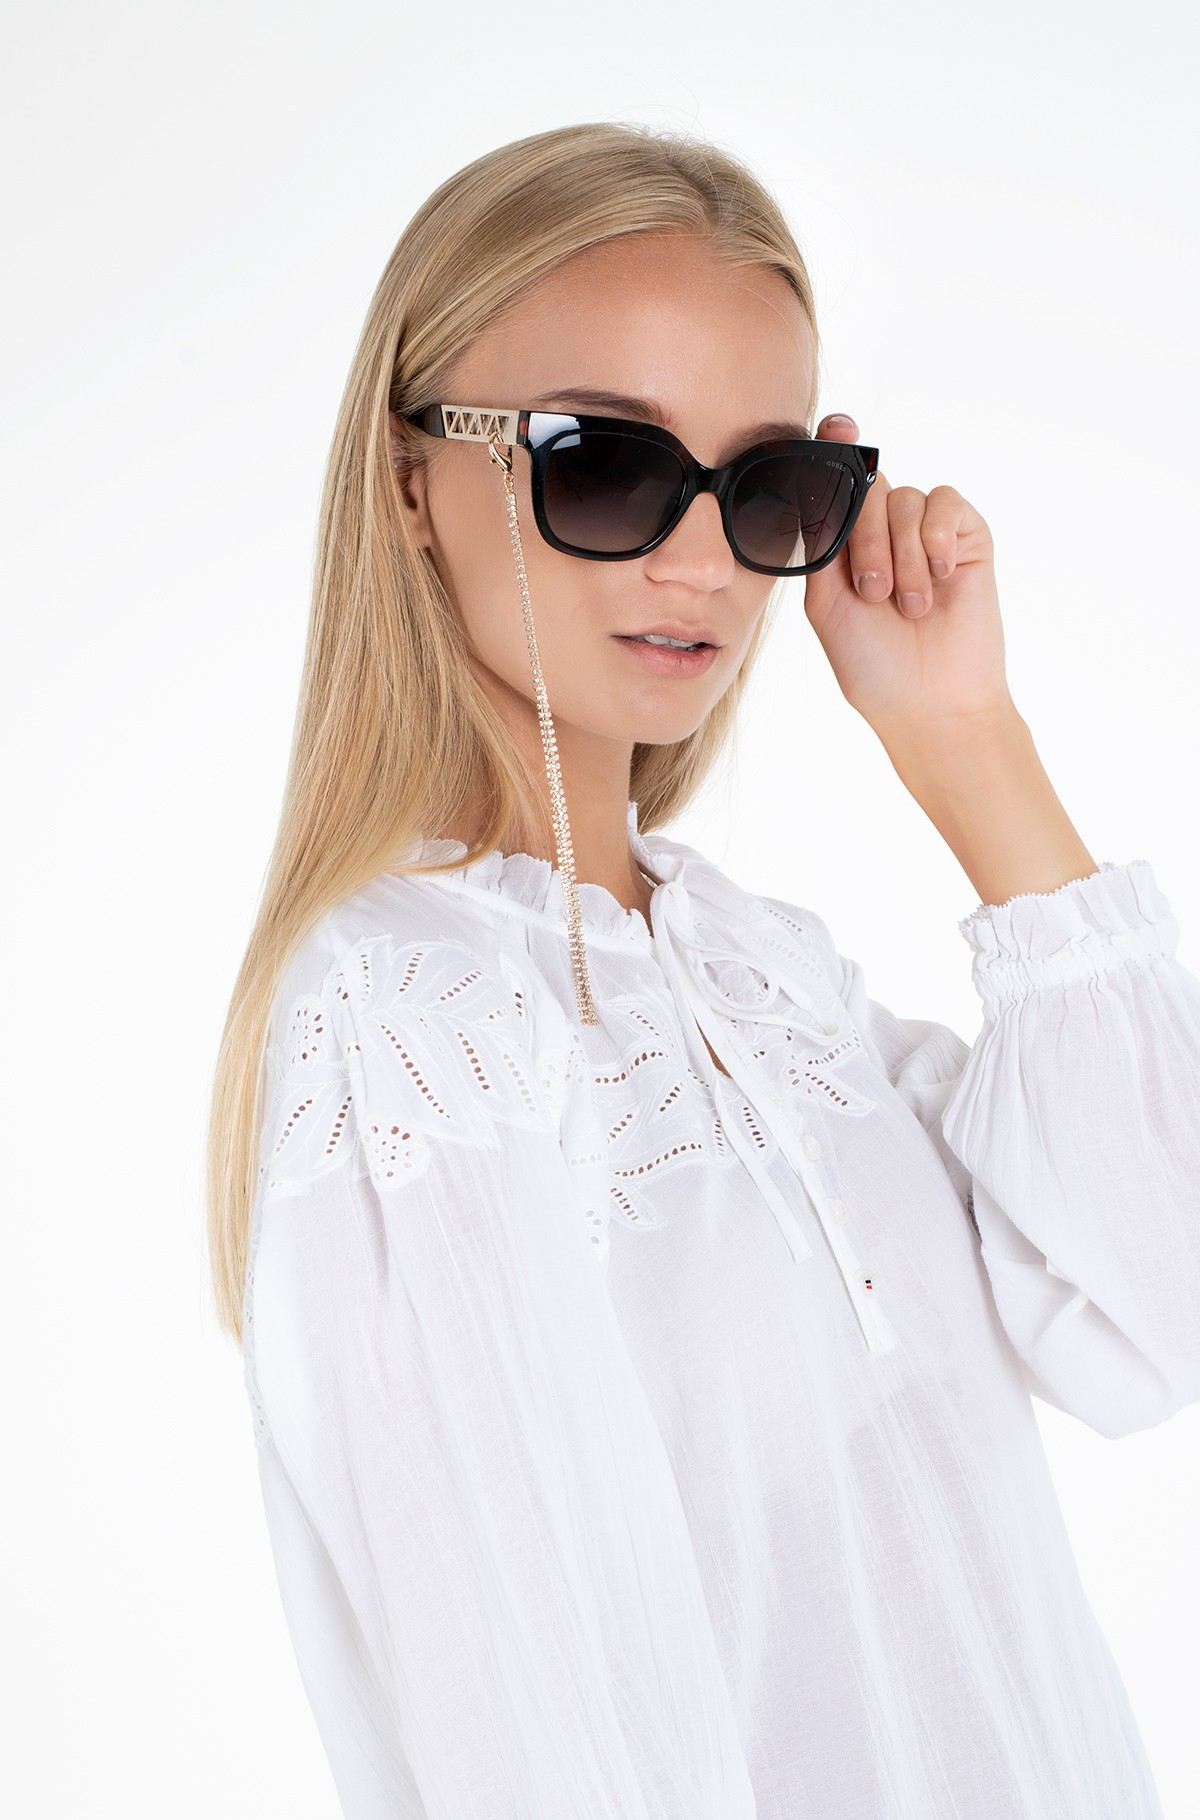 Sunglasses 7691-full-1